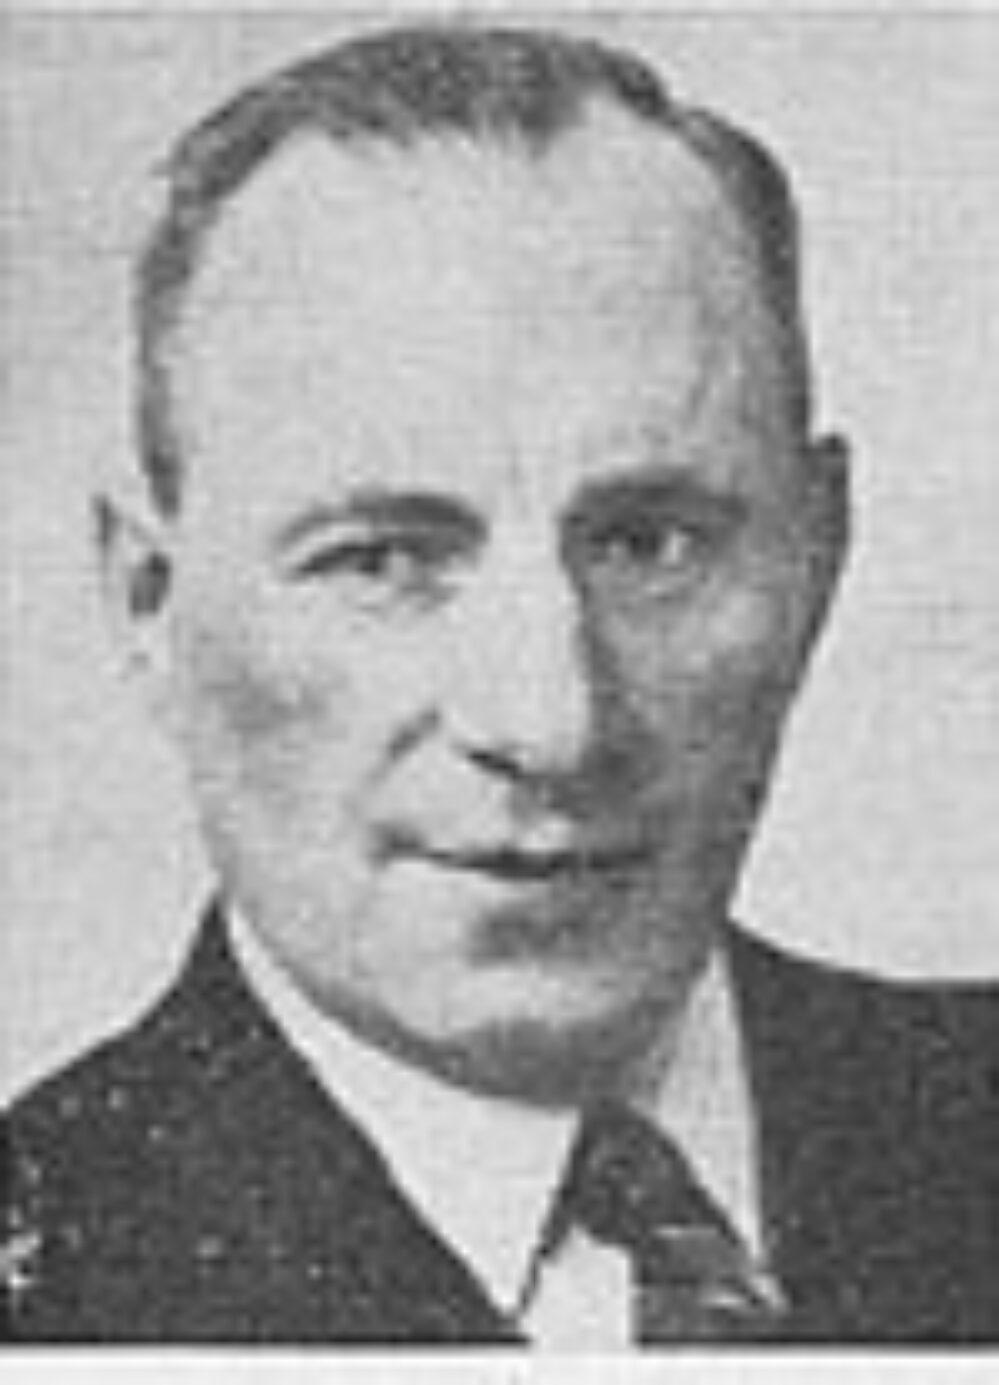 Marius Kristian Angel Giæver